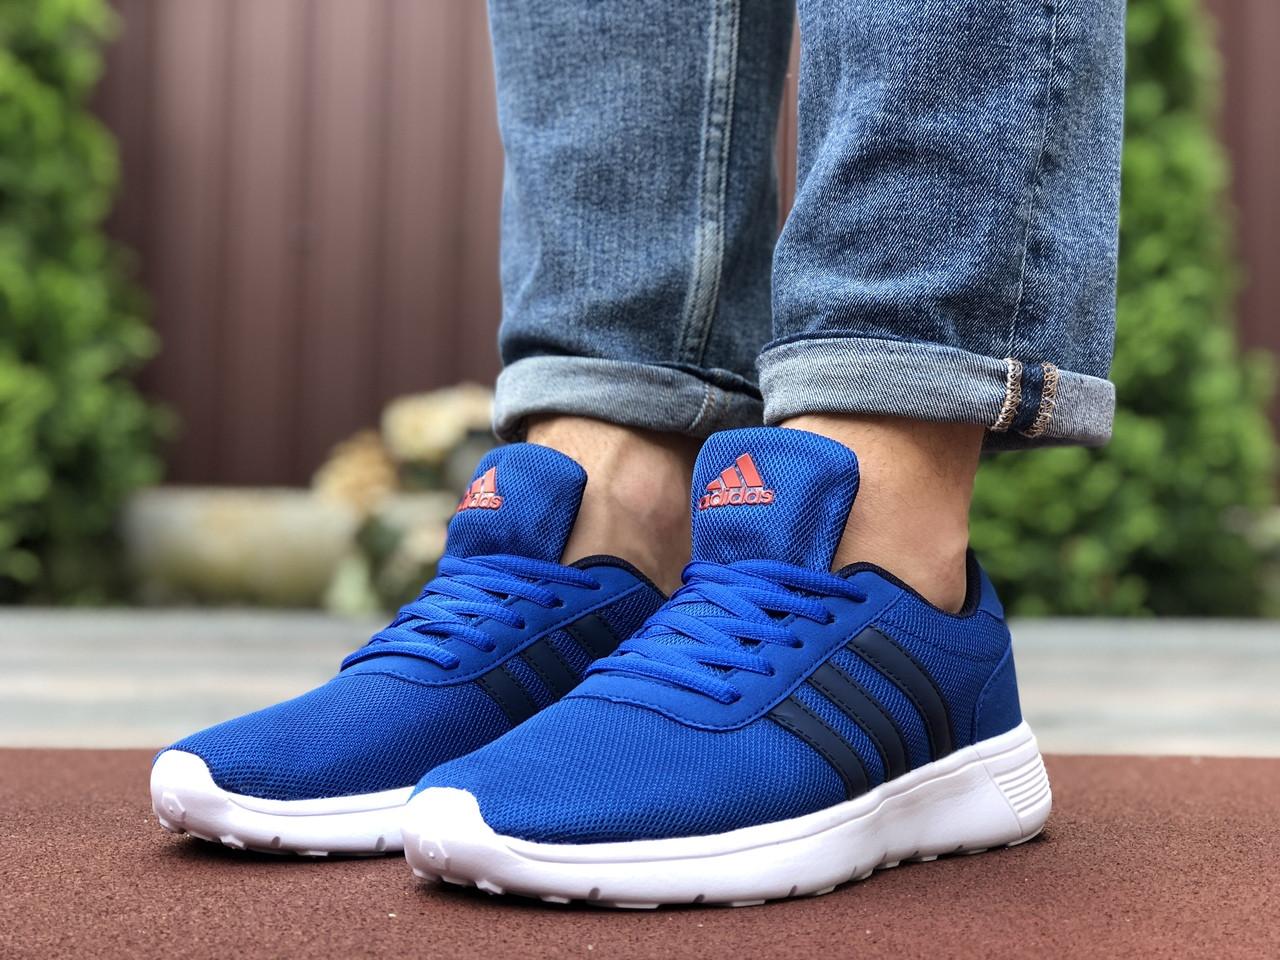 Синие кроссовки мужские сетка классика мягкие